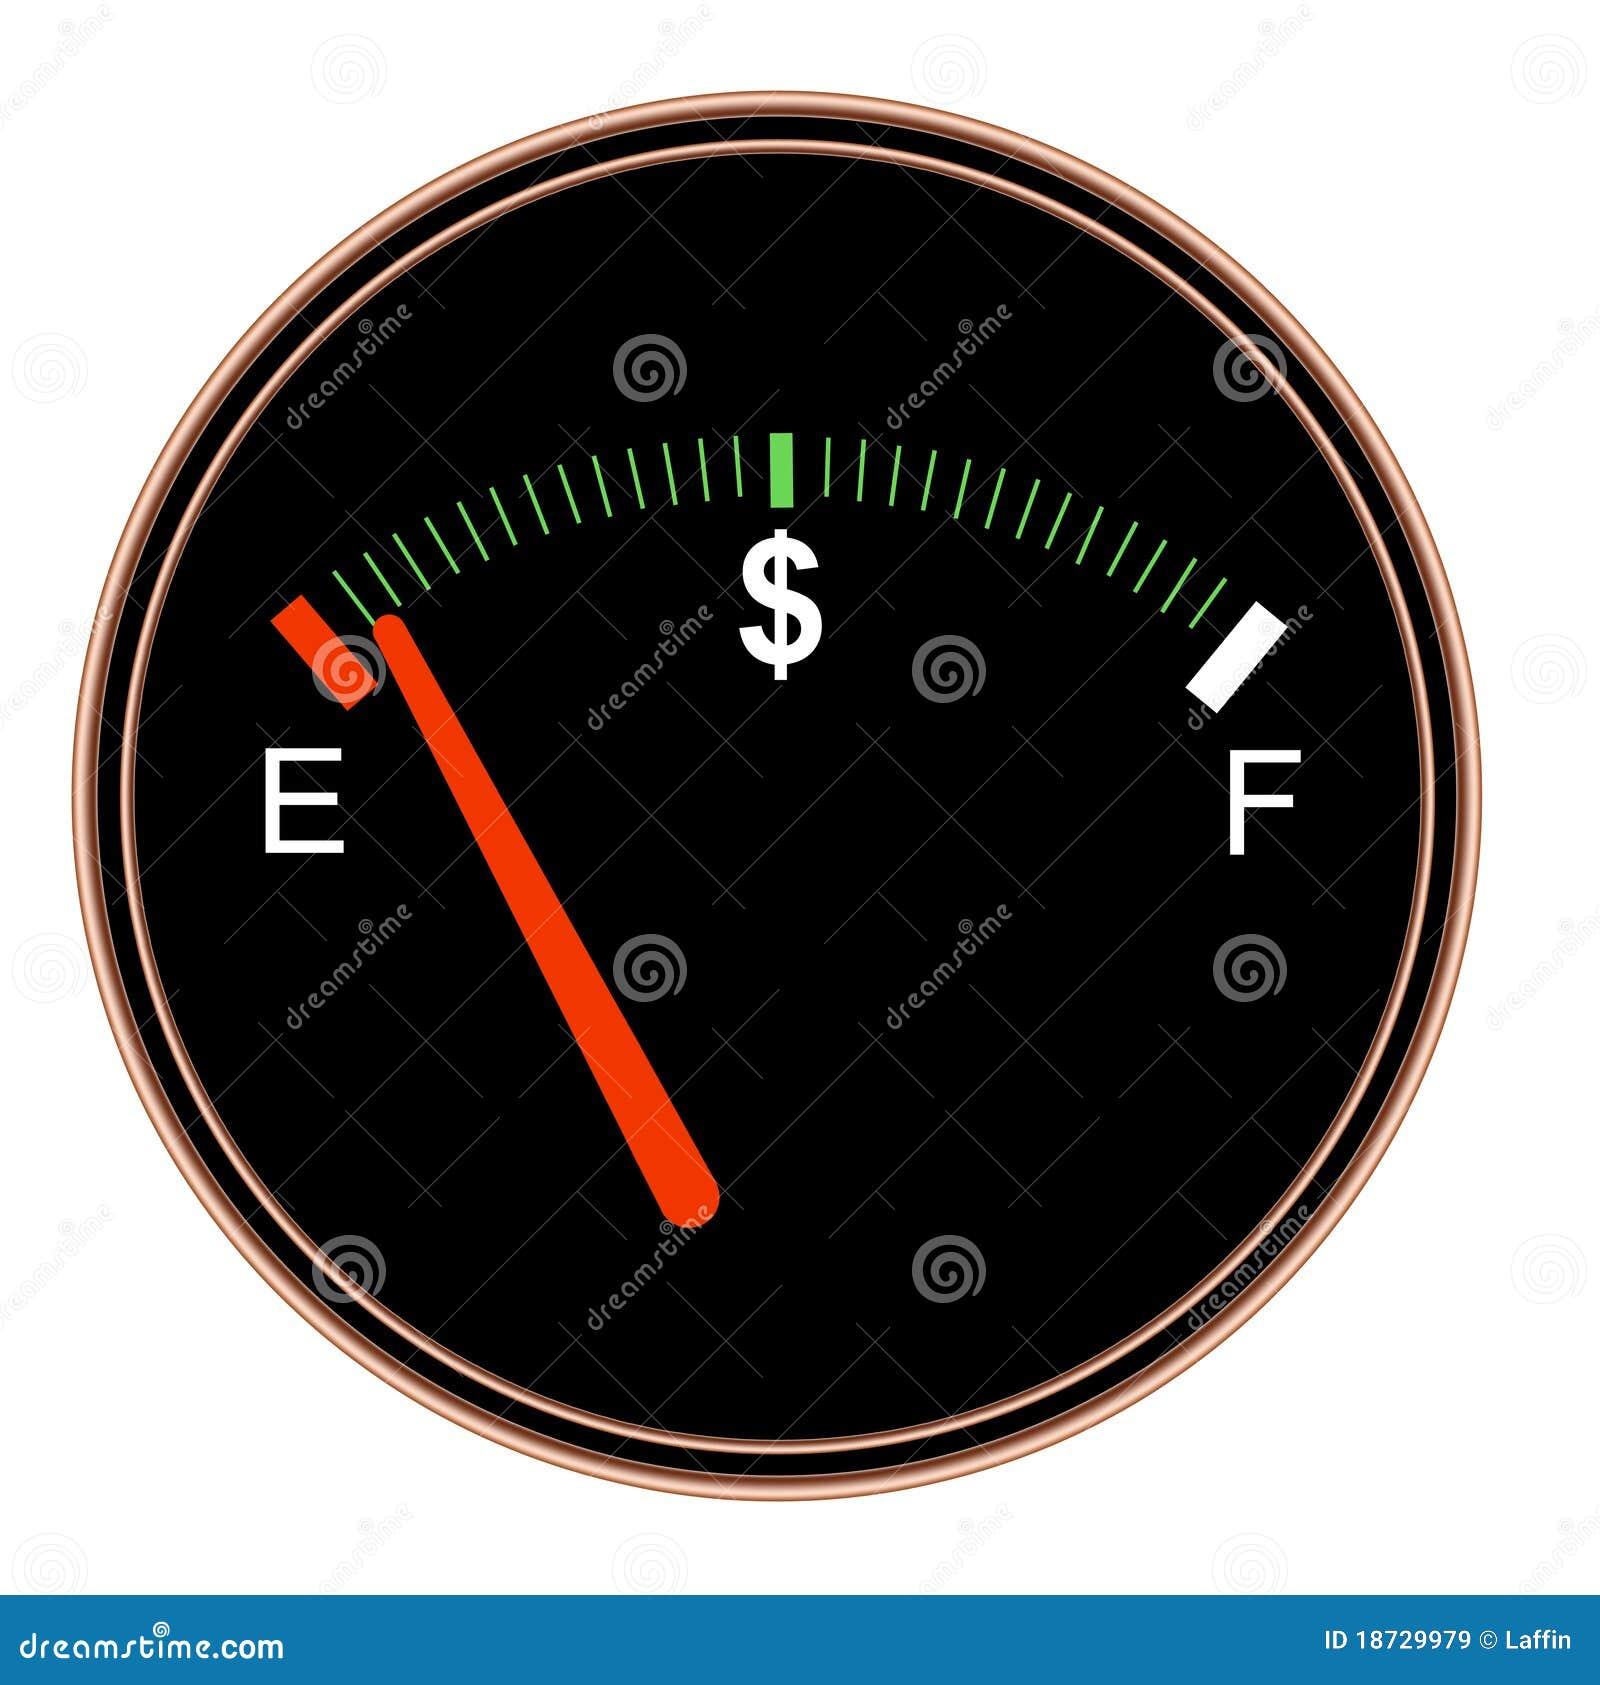 moreover O Fuel Gauge Empty Facebook besides Fuel Gauge   Auto Car Fuel Gauge Icon together with Low Fuel Gauge additionally Kegco. on empty gas gauge